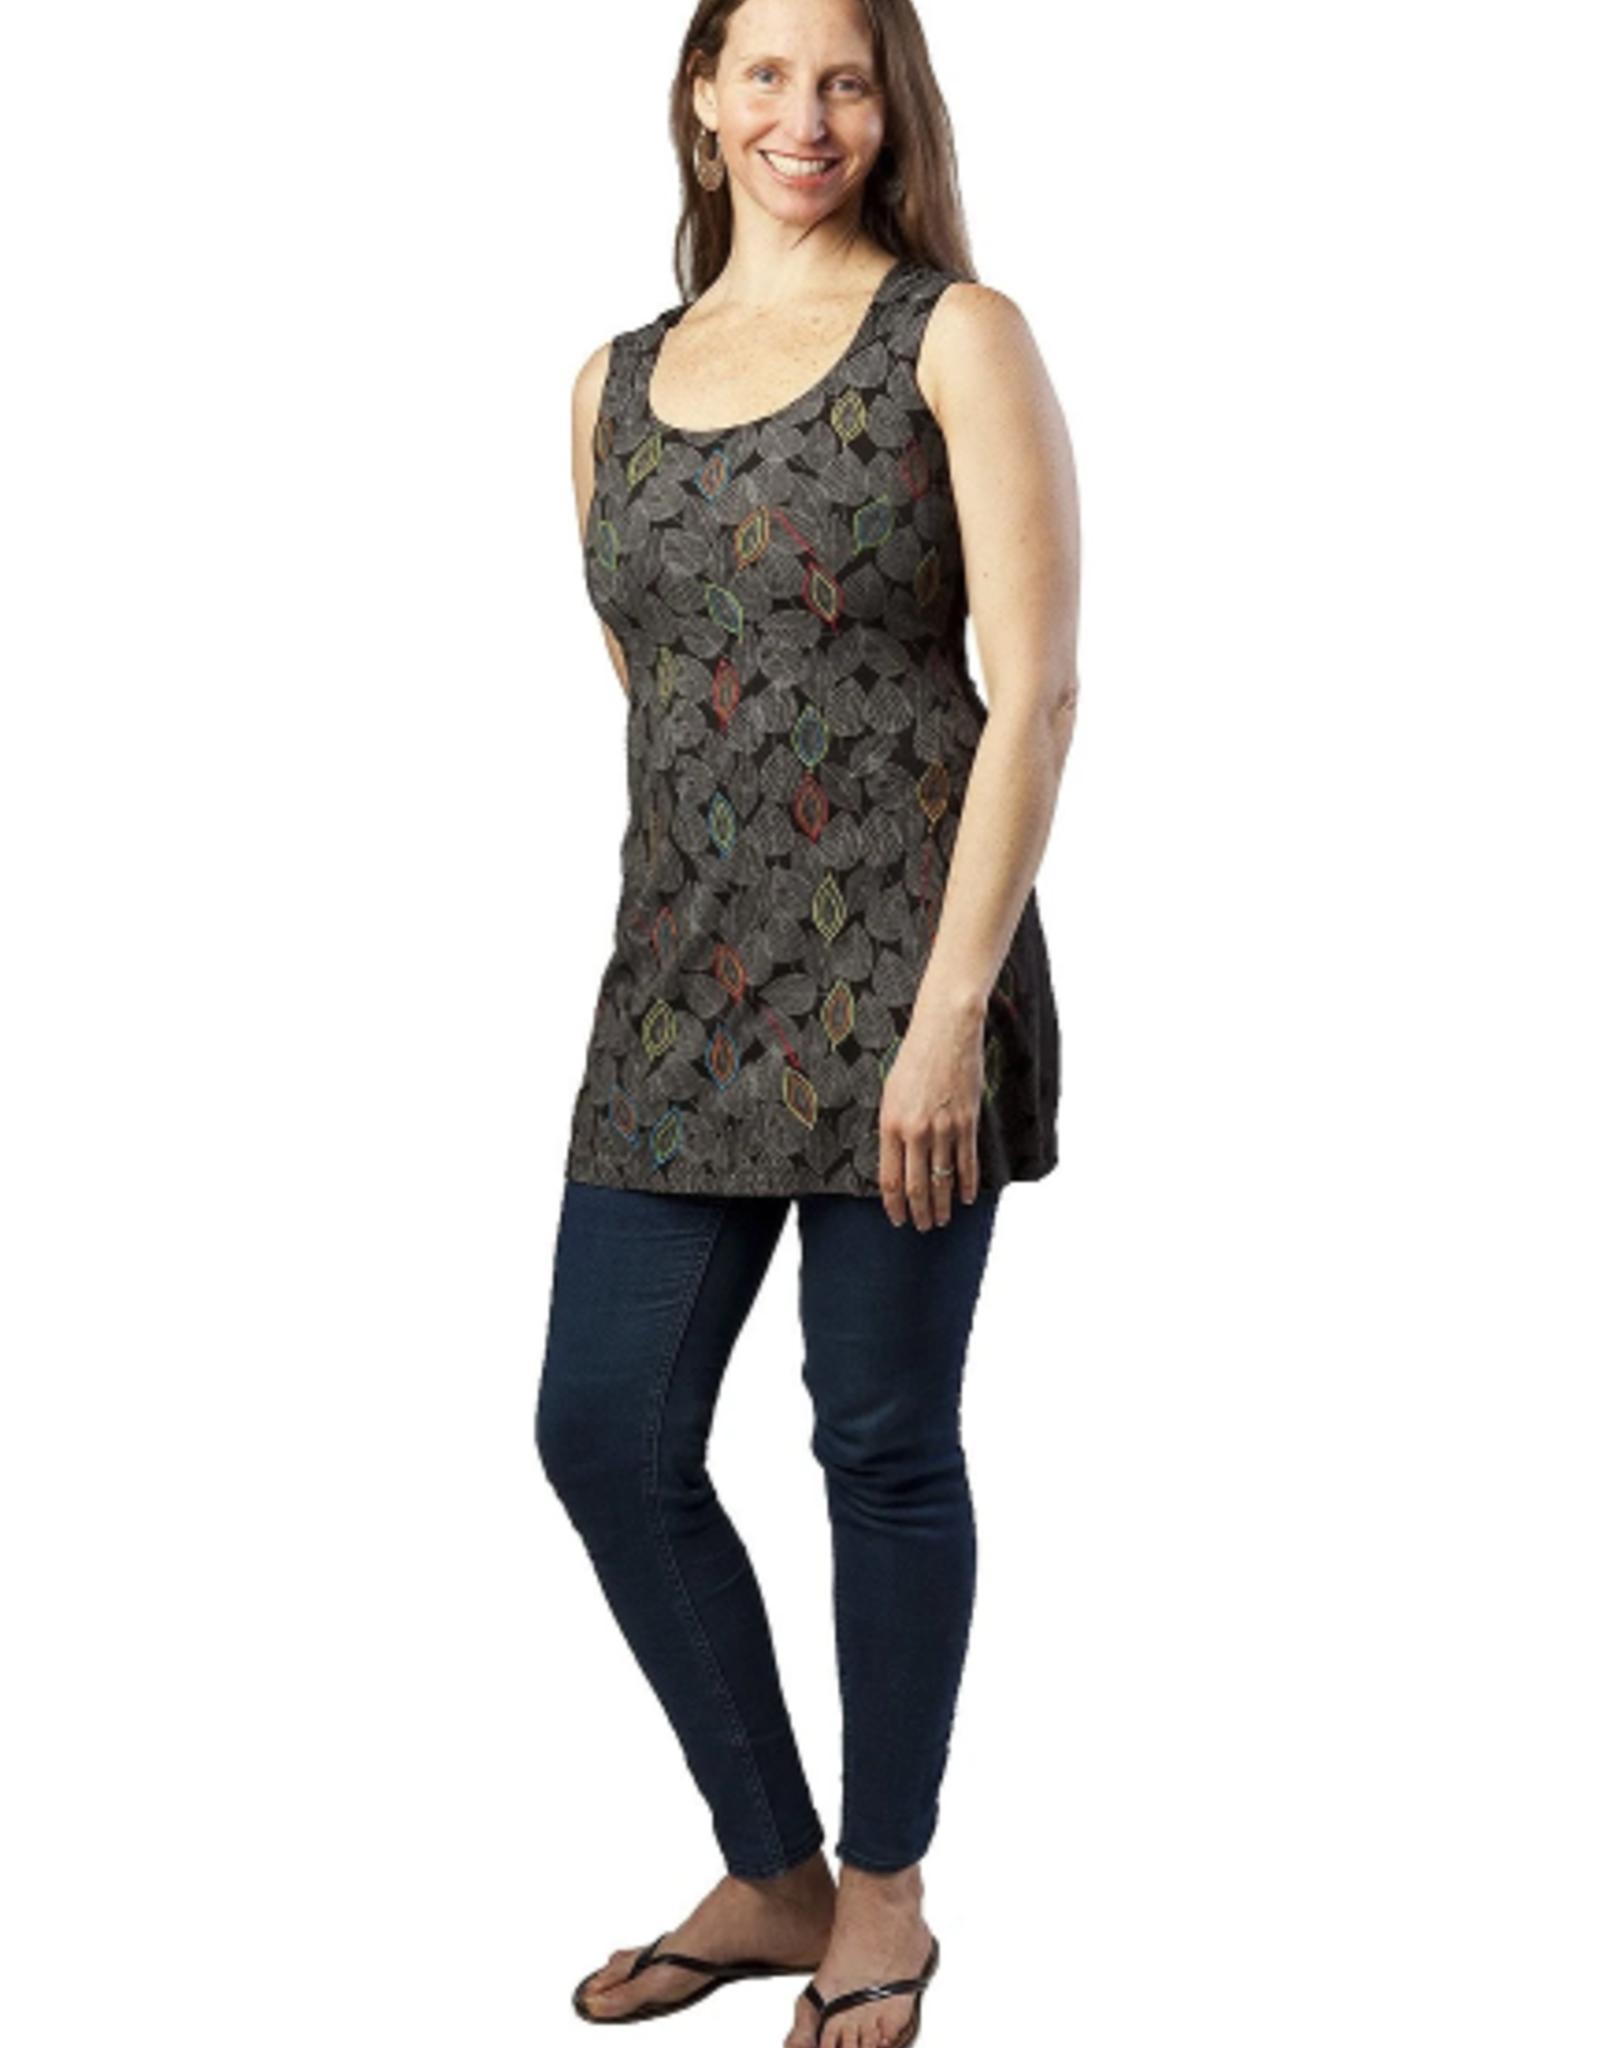 Black Eden Tunic/Dress (Small)